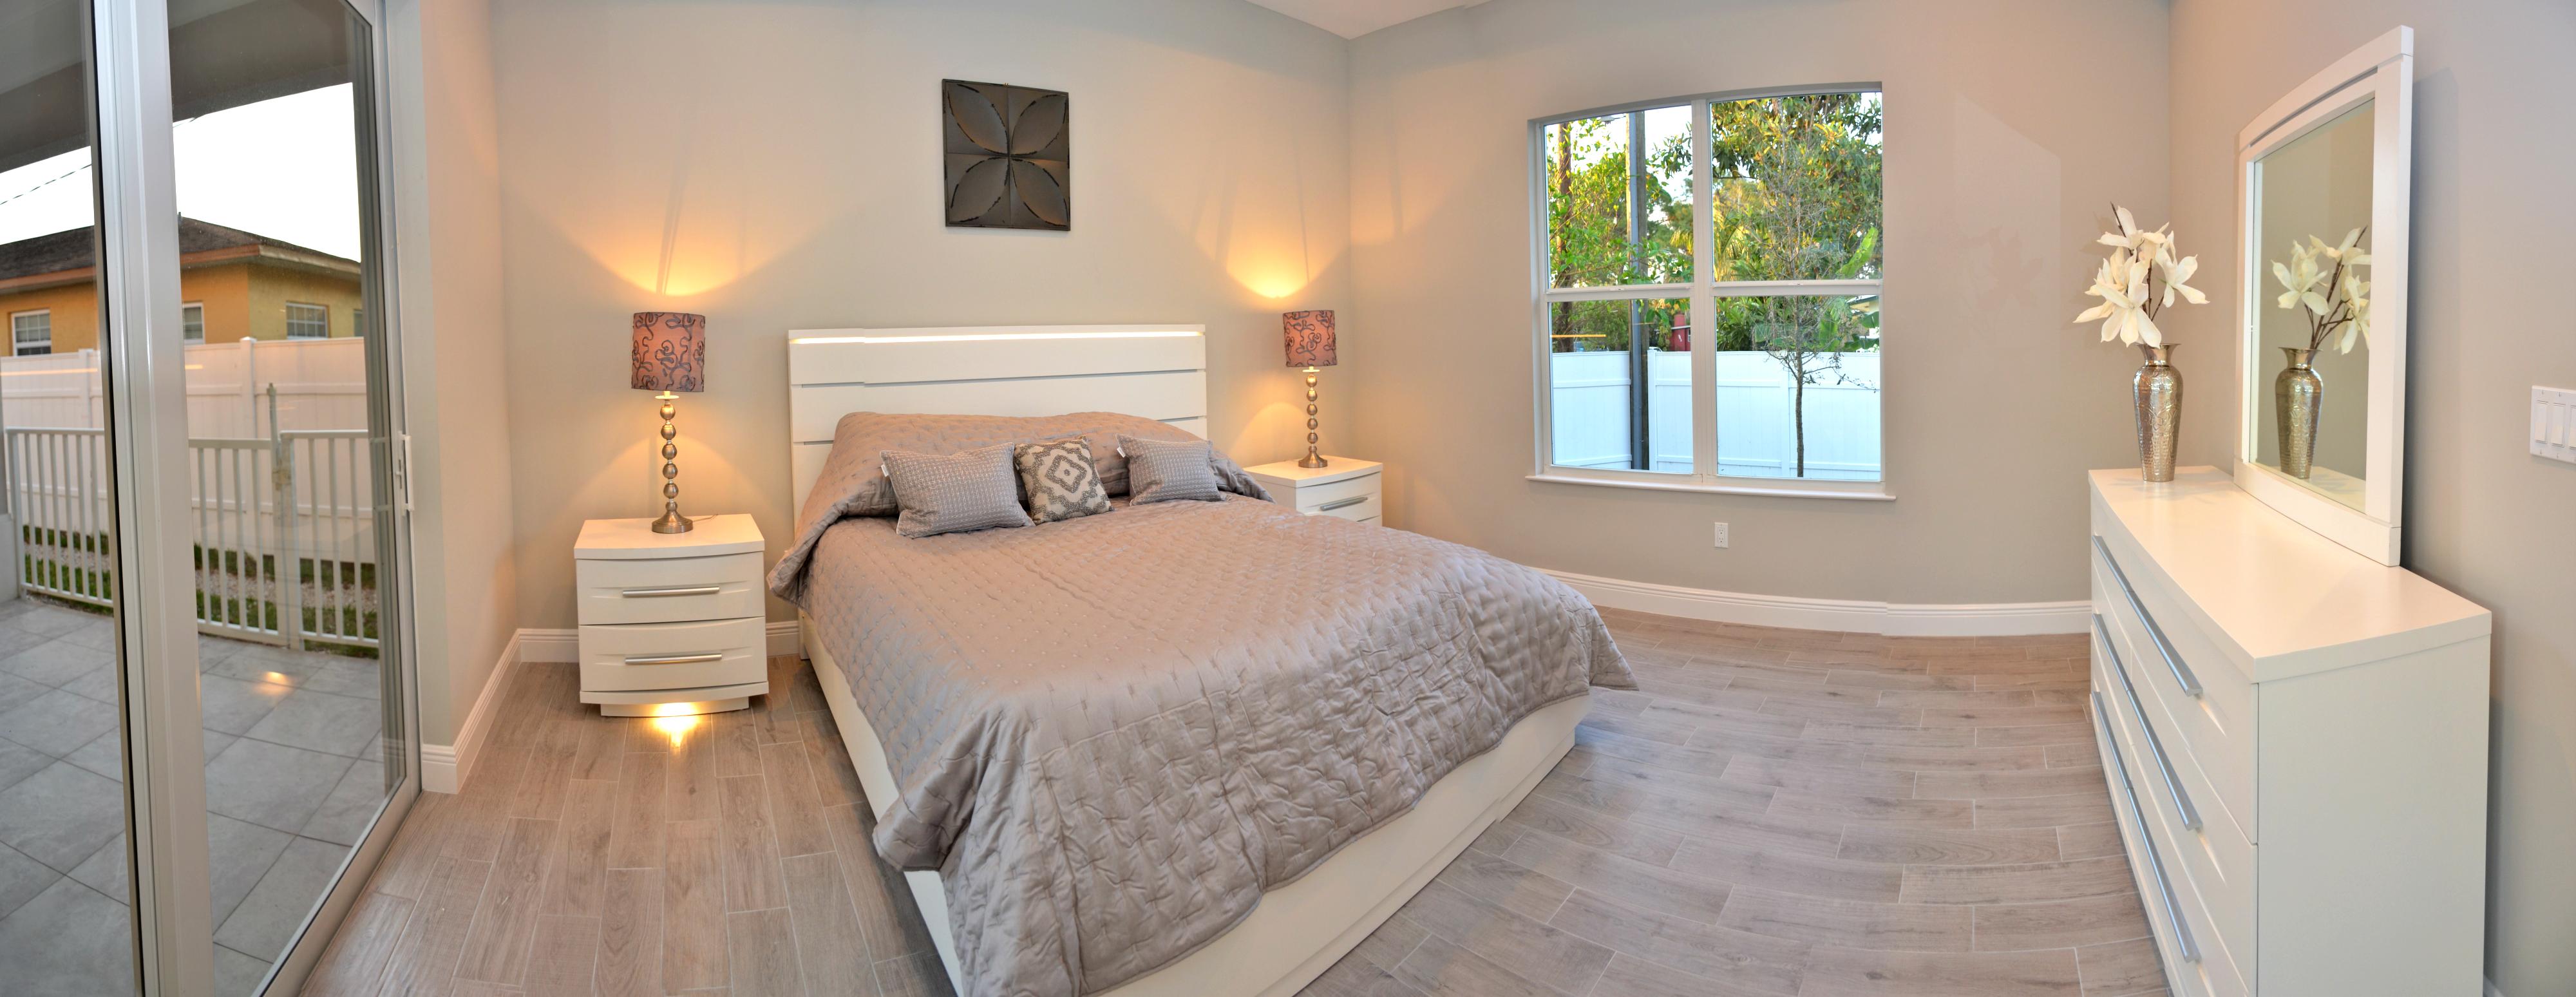 Master Bedroom West Indies Modern Home